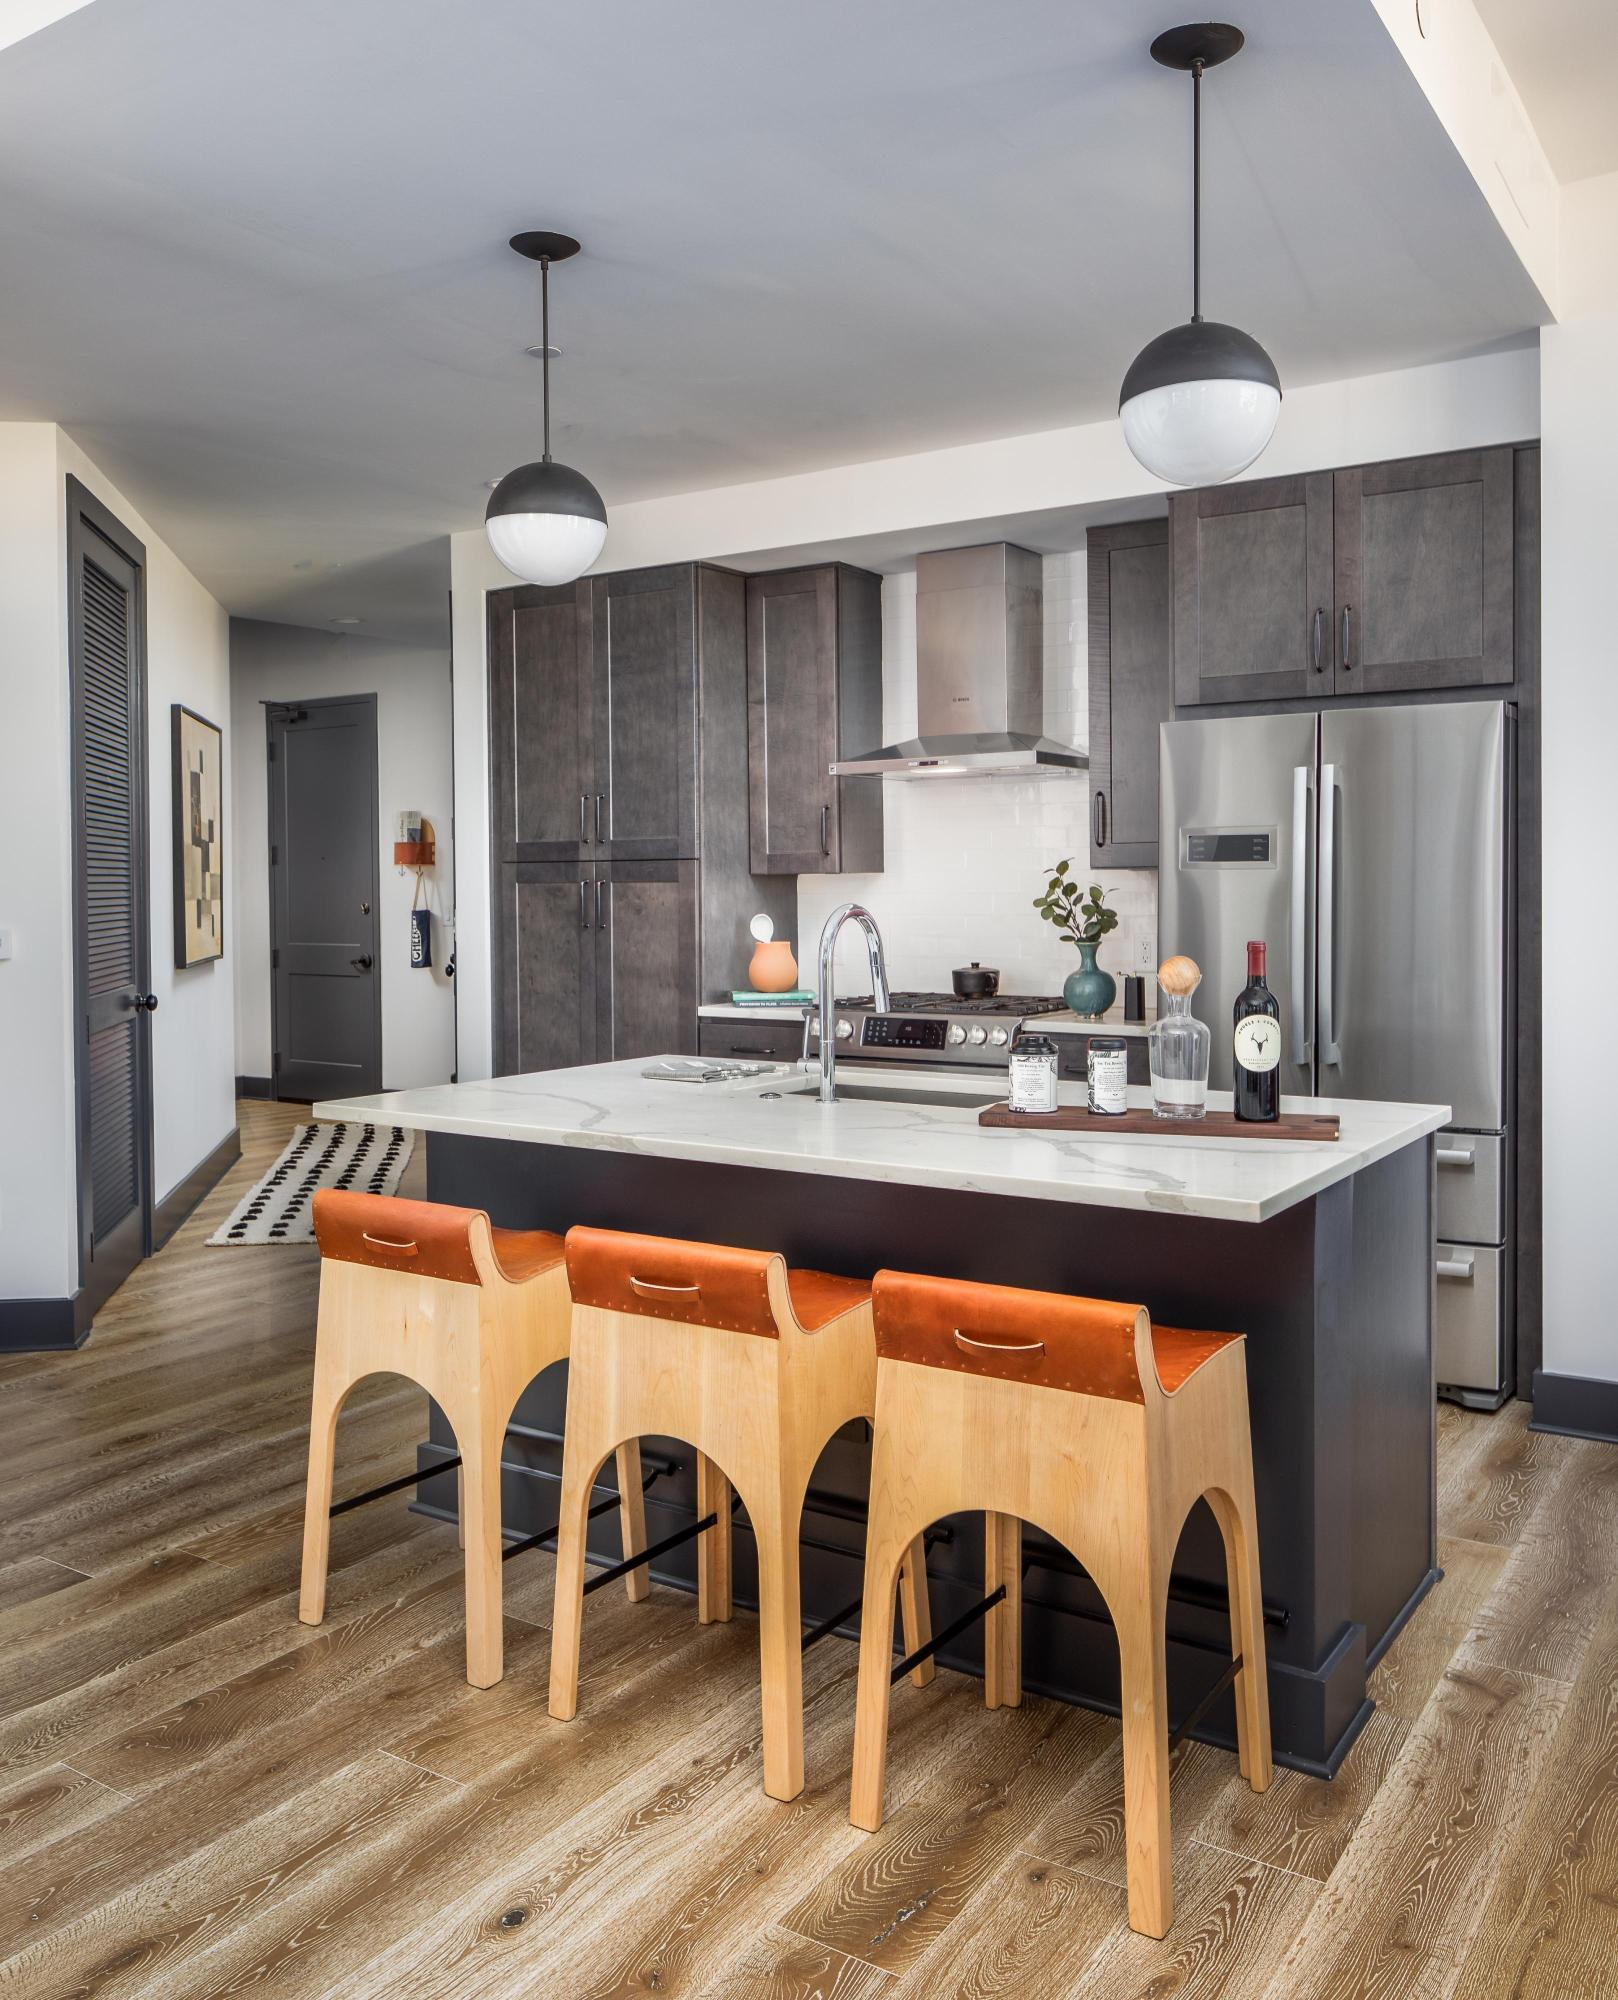 Gadsdenboro Homes For Sale - 5 Gadsdenboro, Charleston, SC - 12